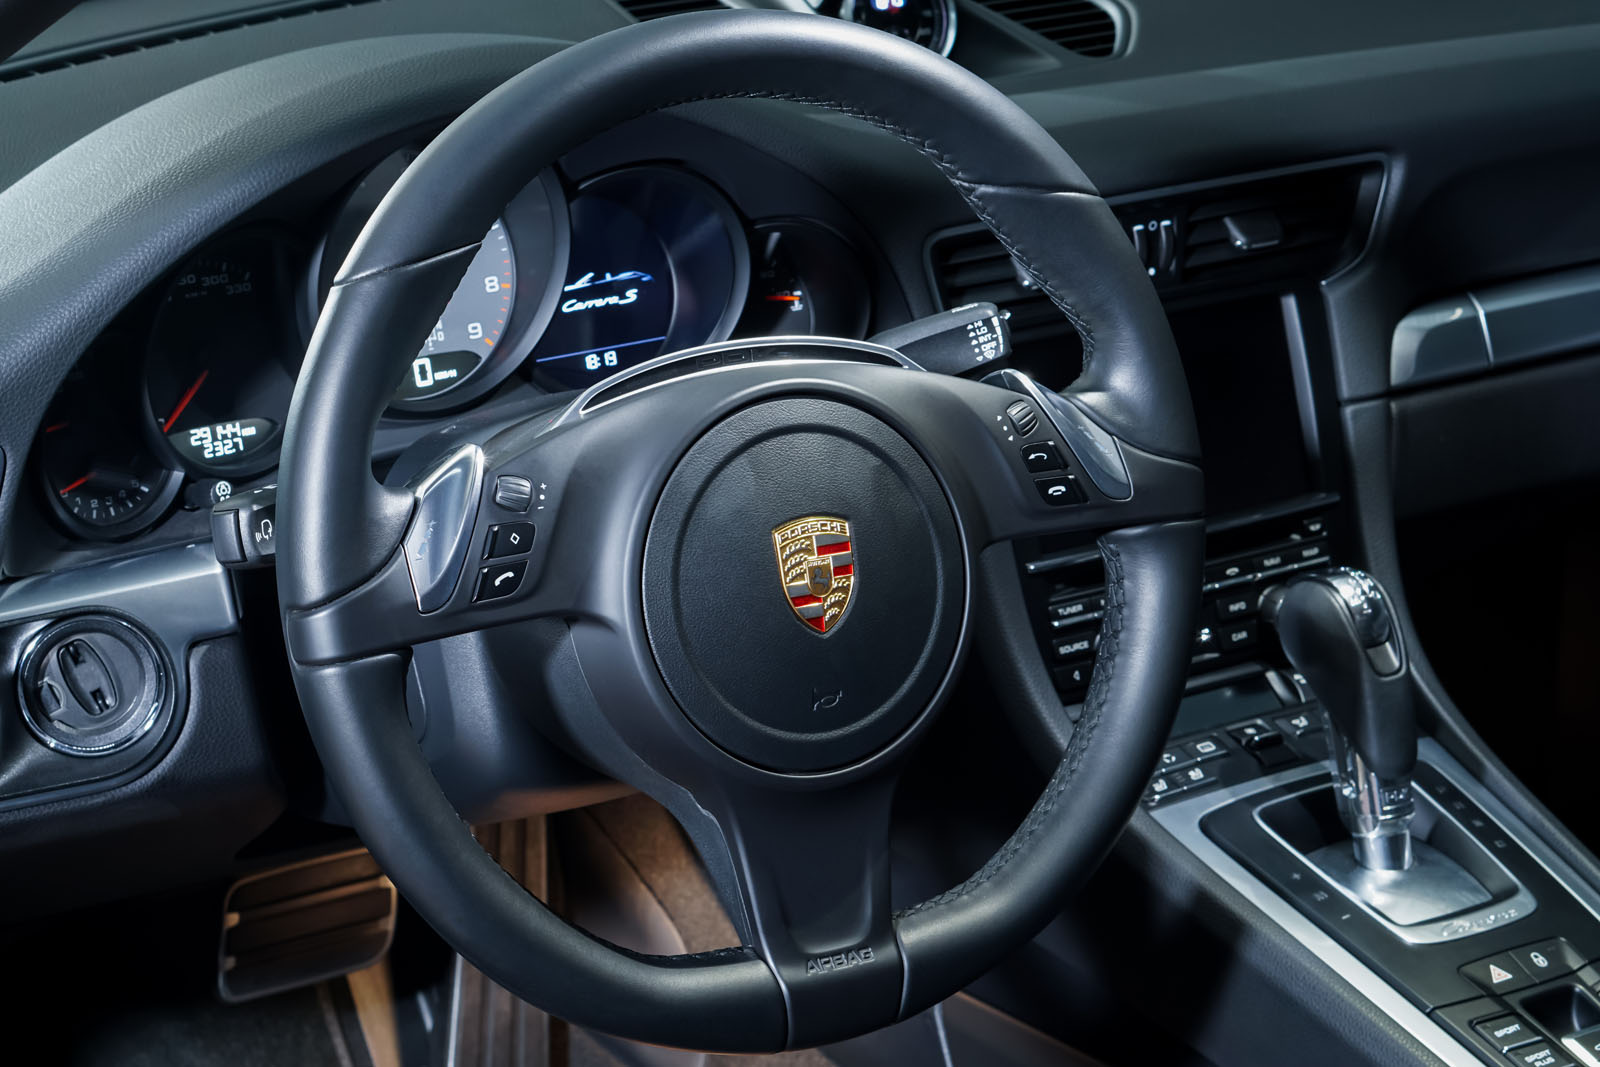 Porsche_991_CarreraS_Cabrio_Schwarz_Schwarz_POR-7555_10_w